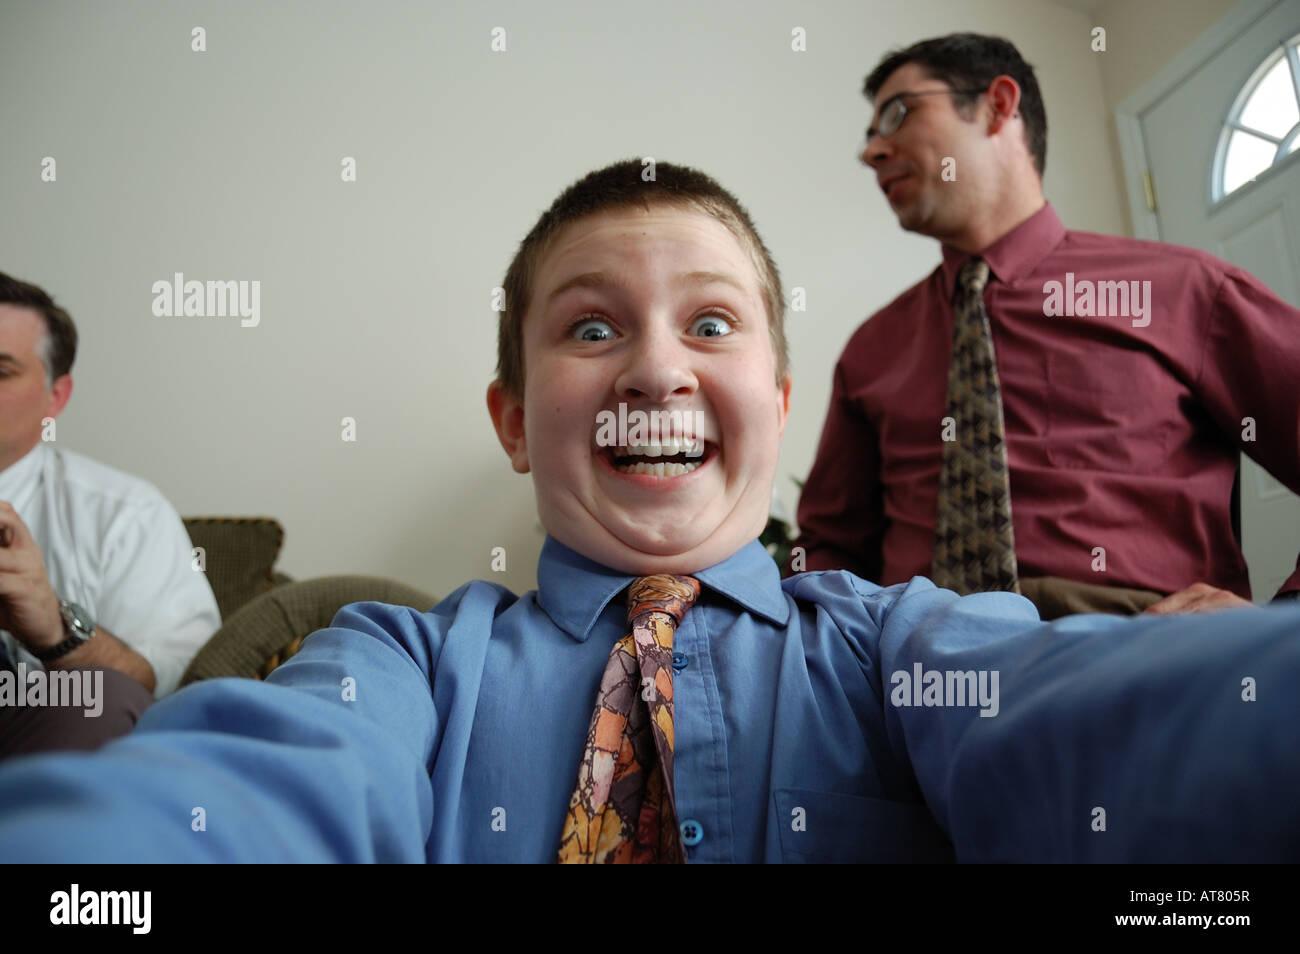 Junge nimmt ein Selbstporträt Stockbild